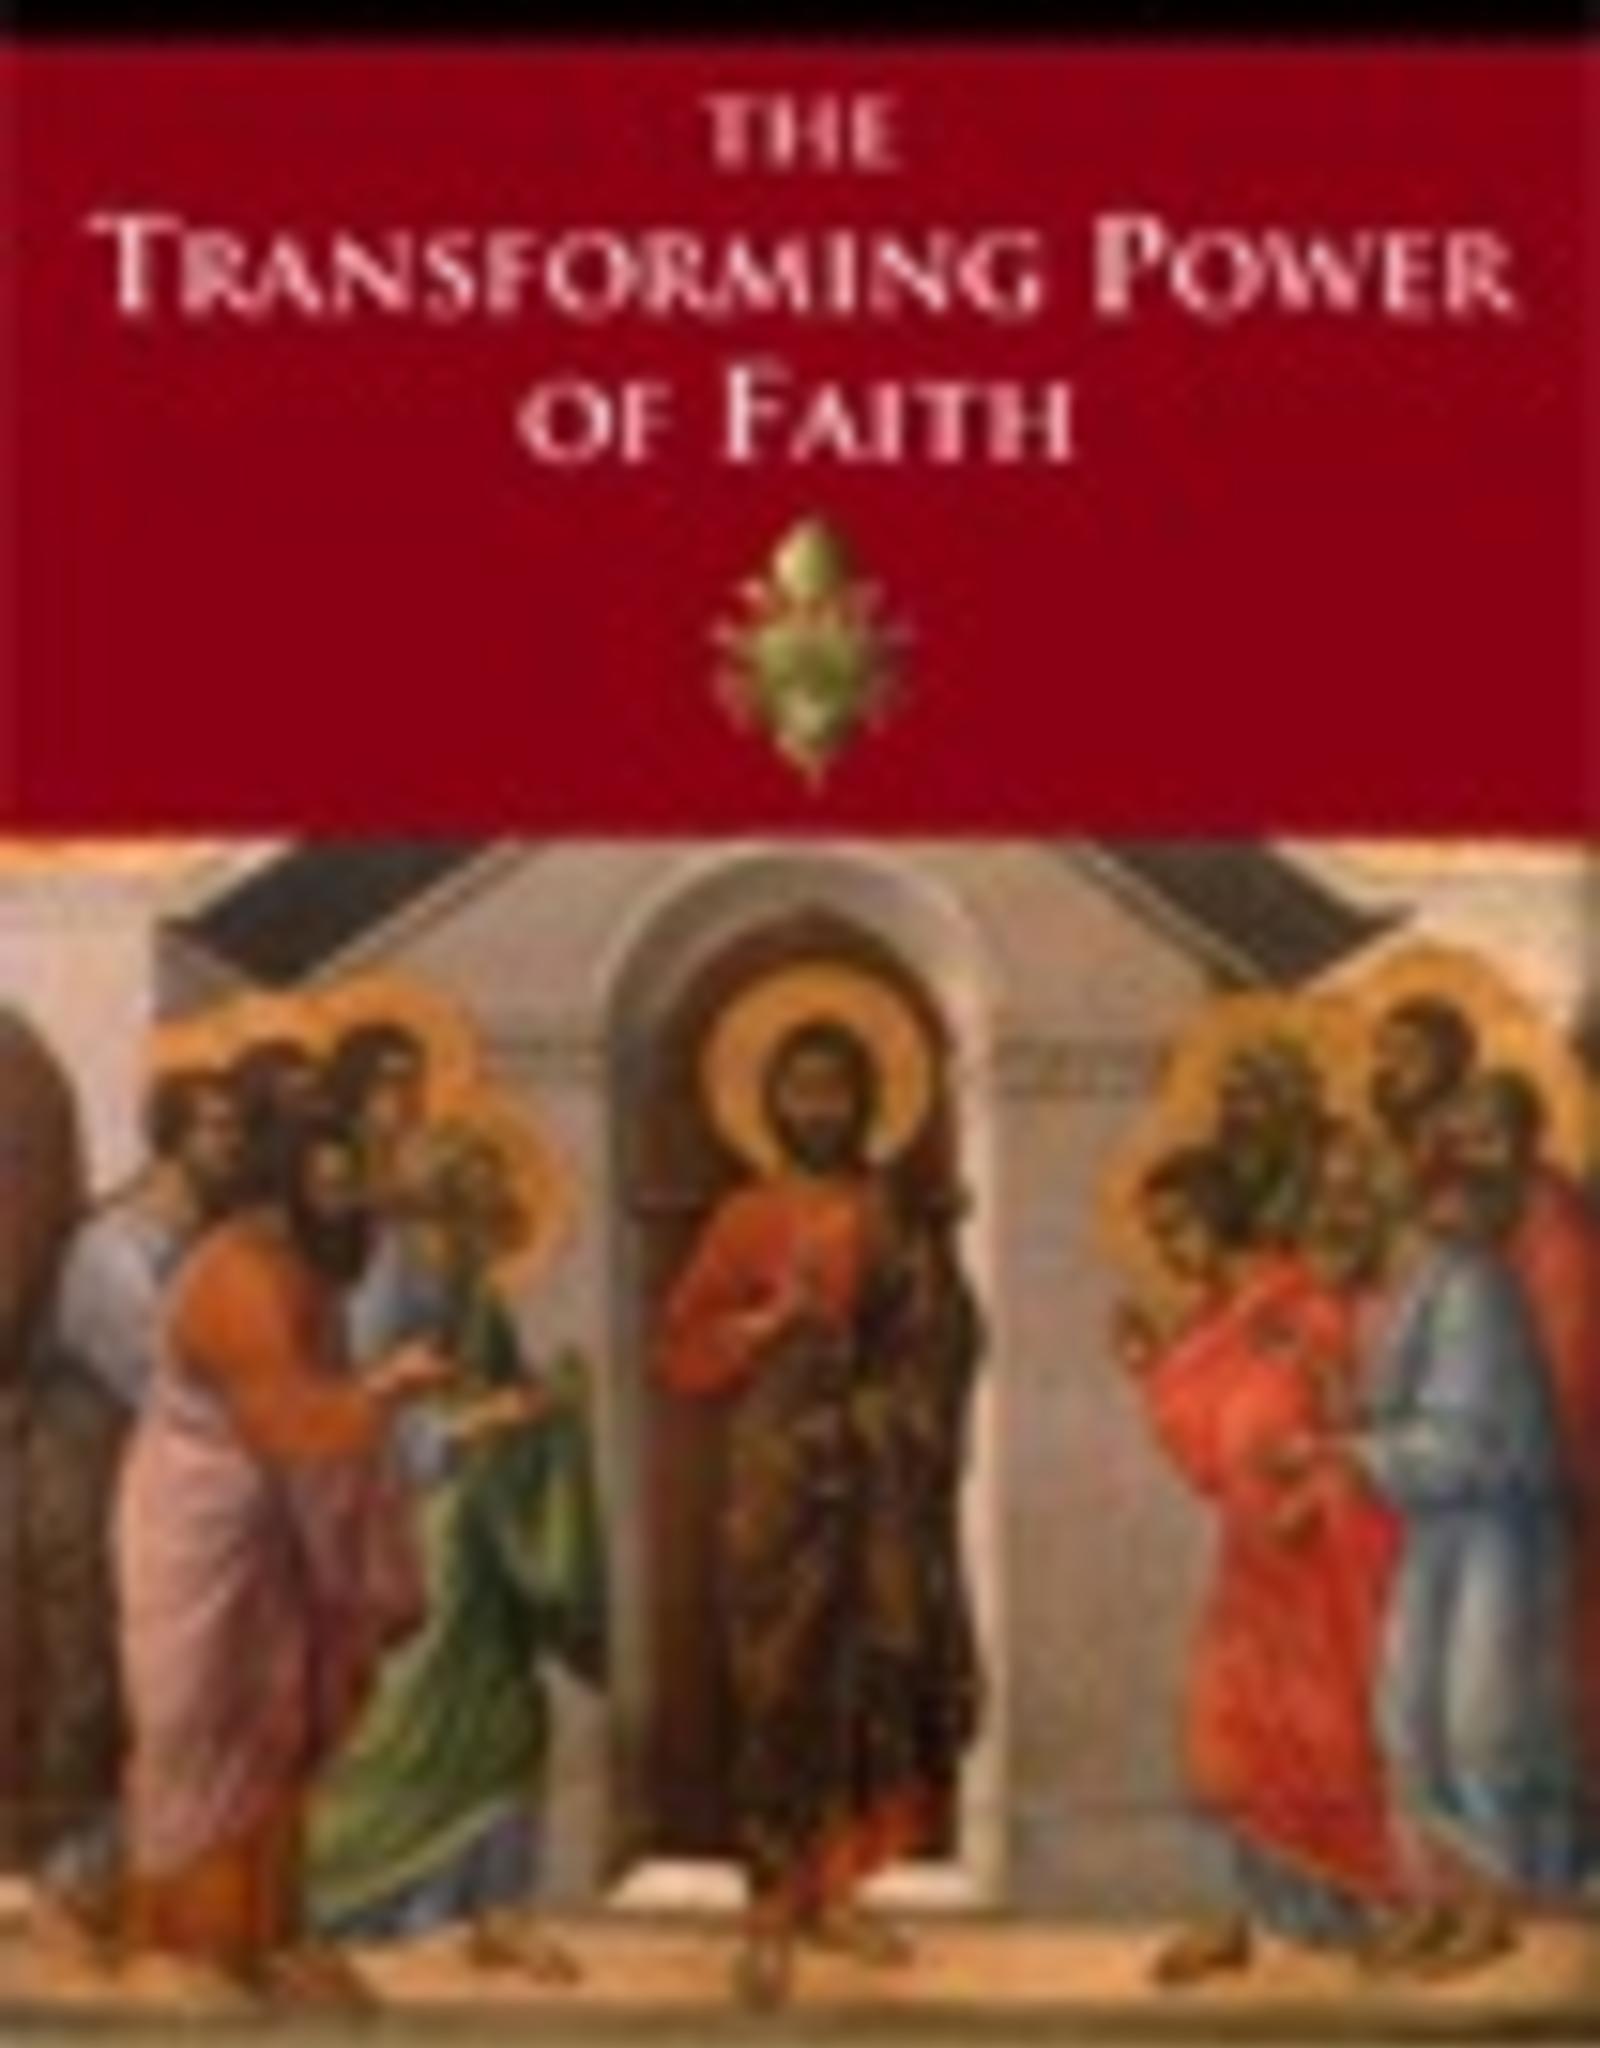 Ignatius Press The Transforming Power of Faith, by Pope Benedict XVI (hardcover)